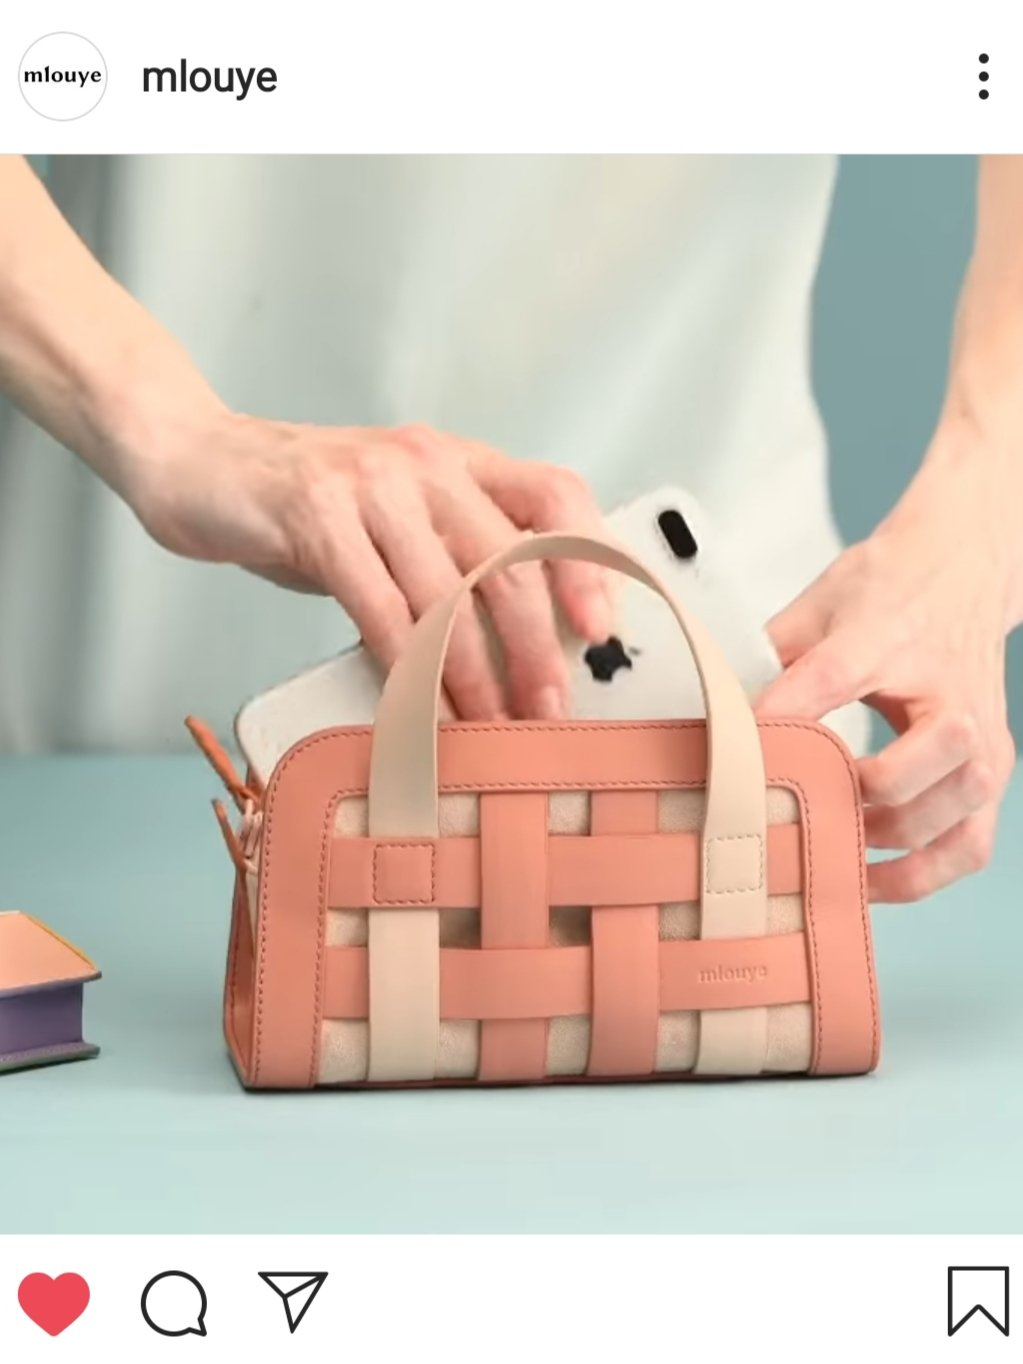 Mlouye Mini Woven bag